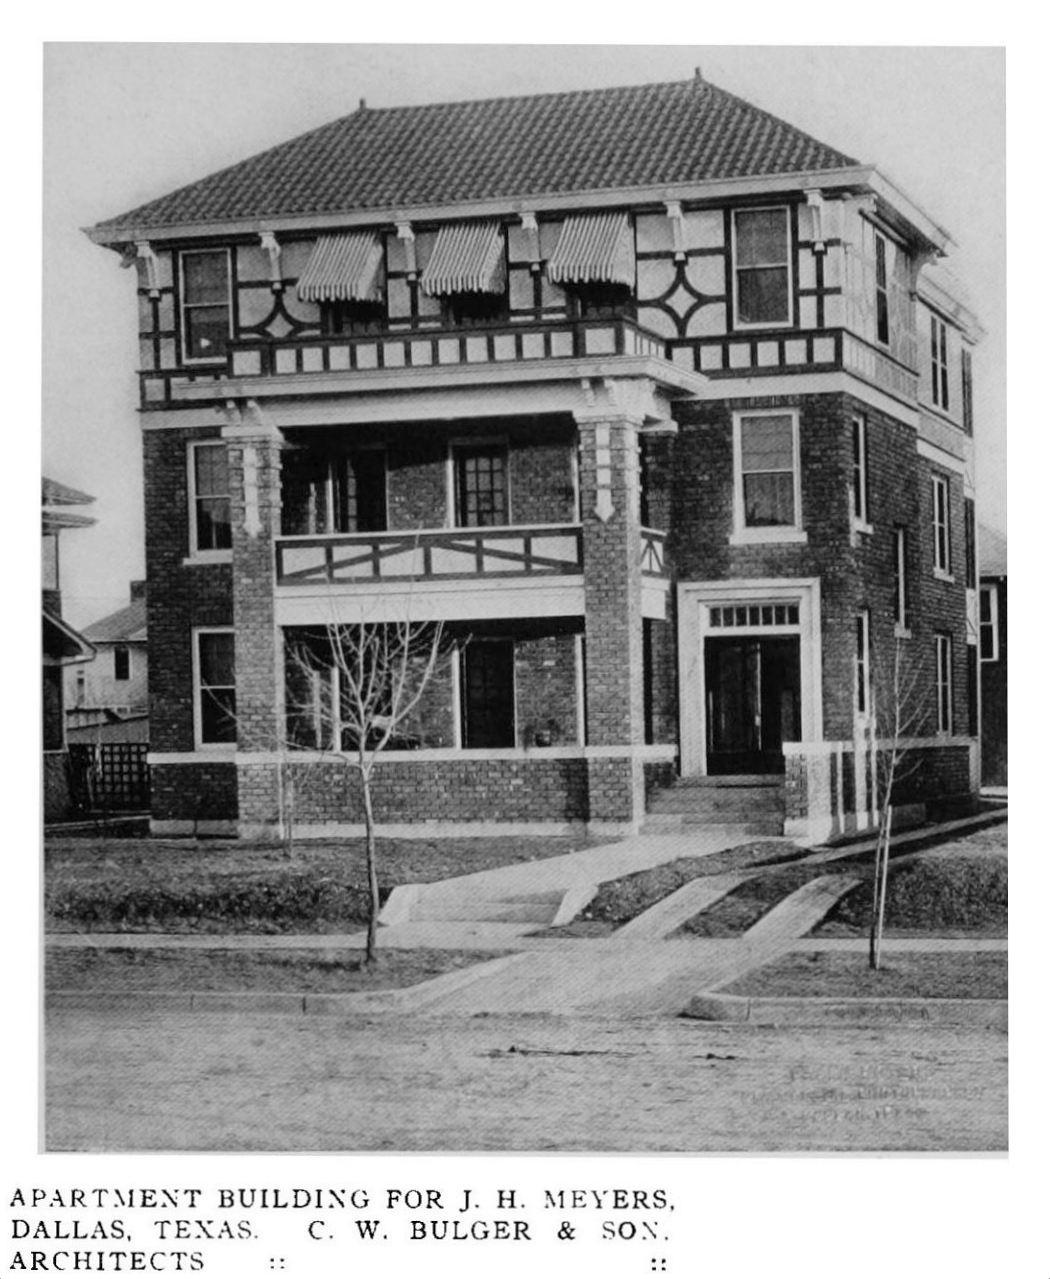 meyers-apartment-house_western-architect_july-1914